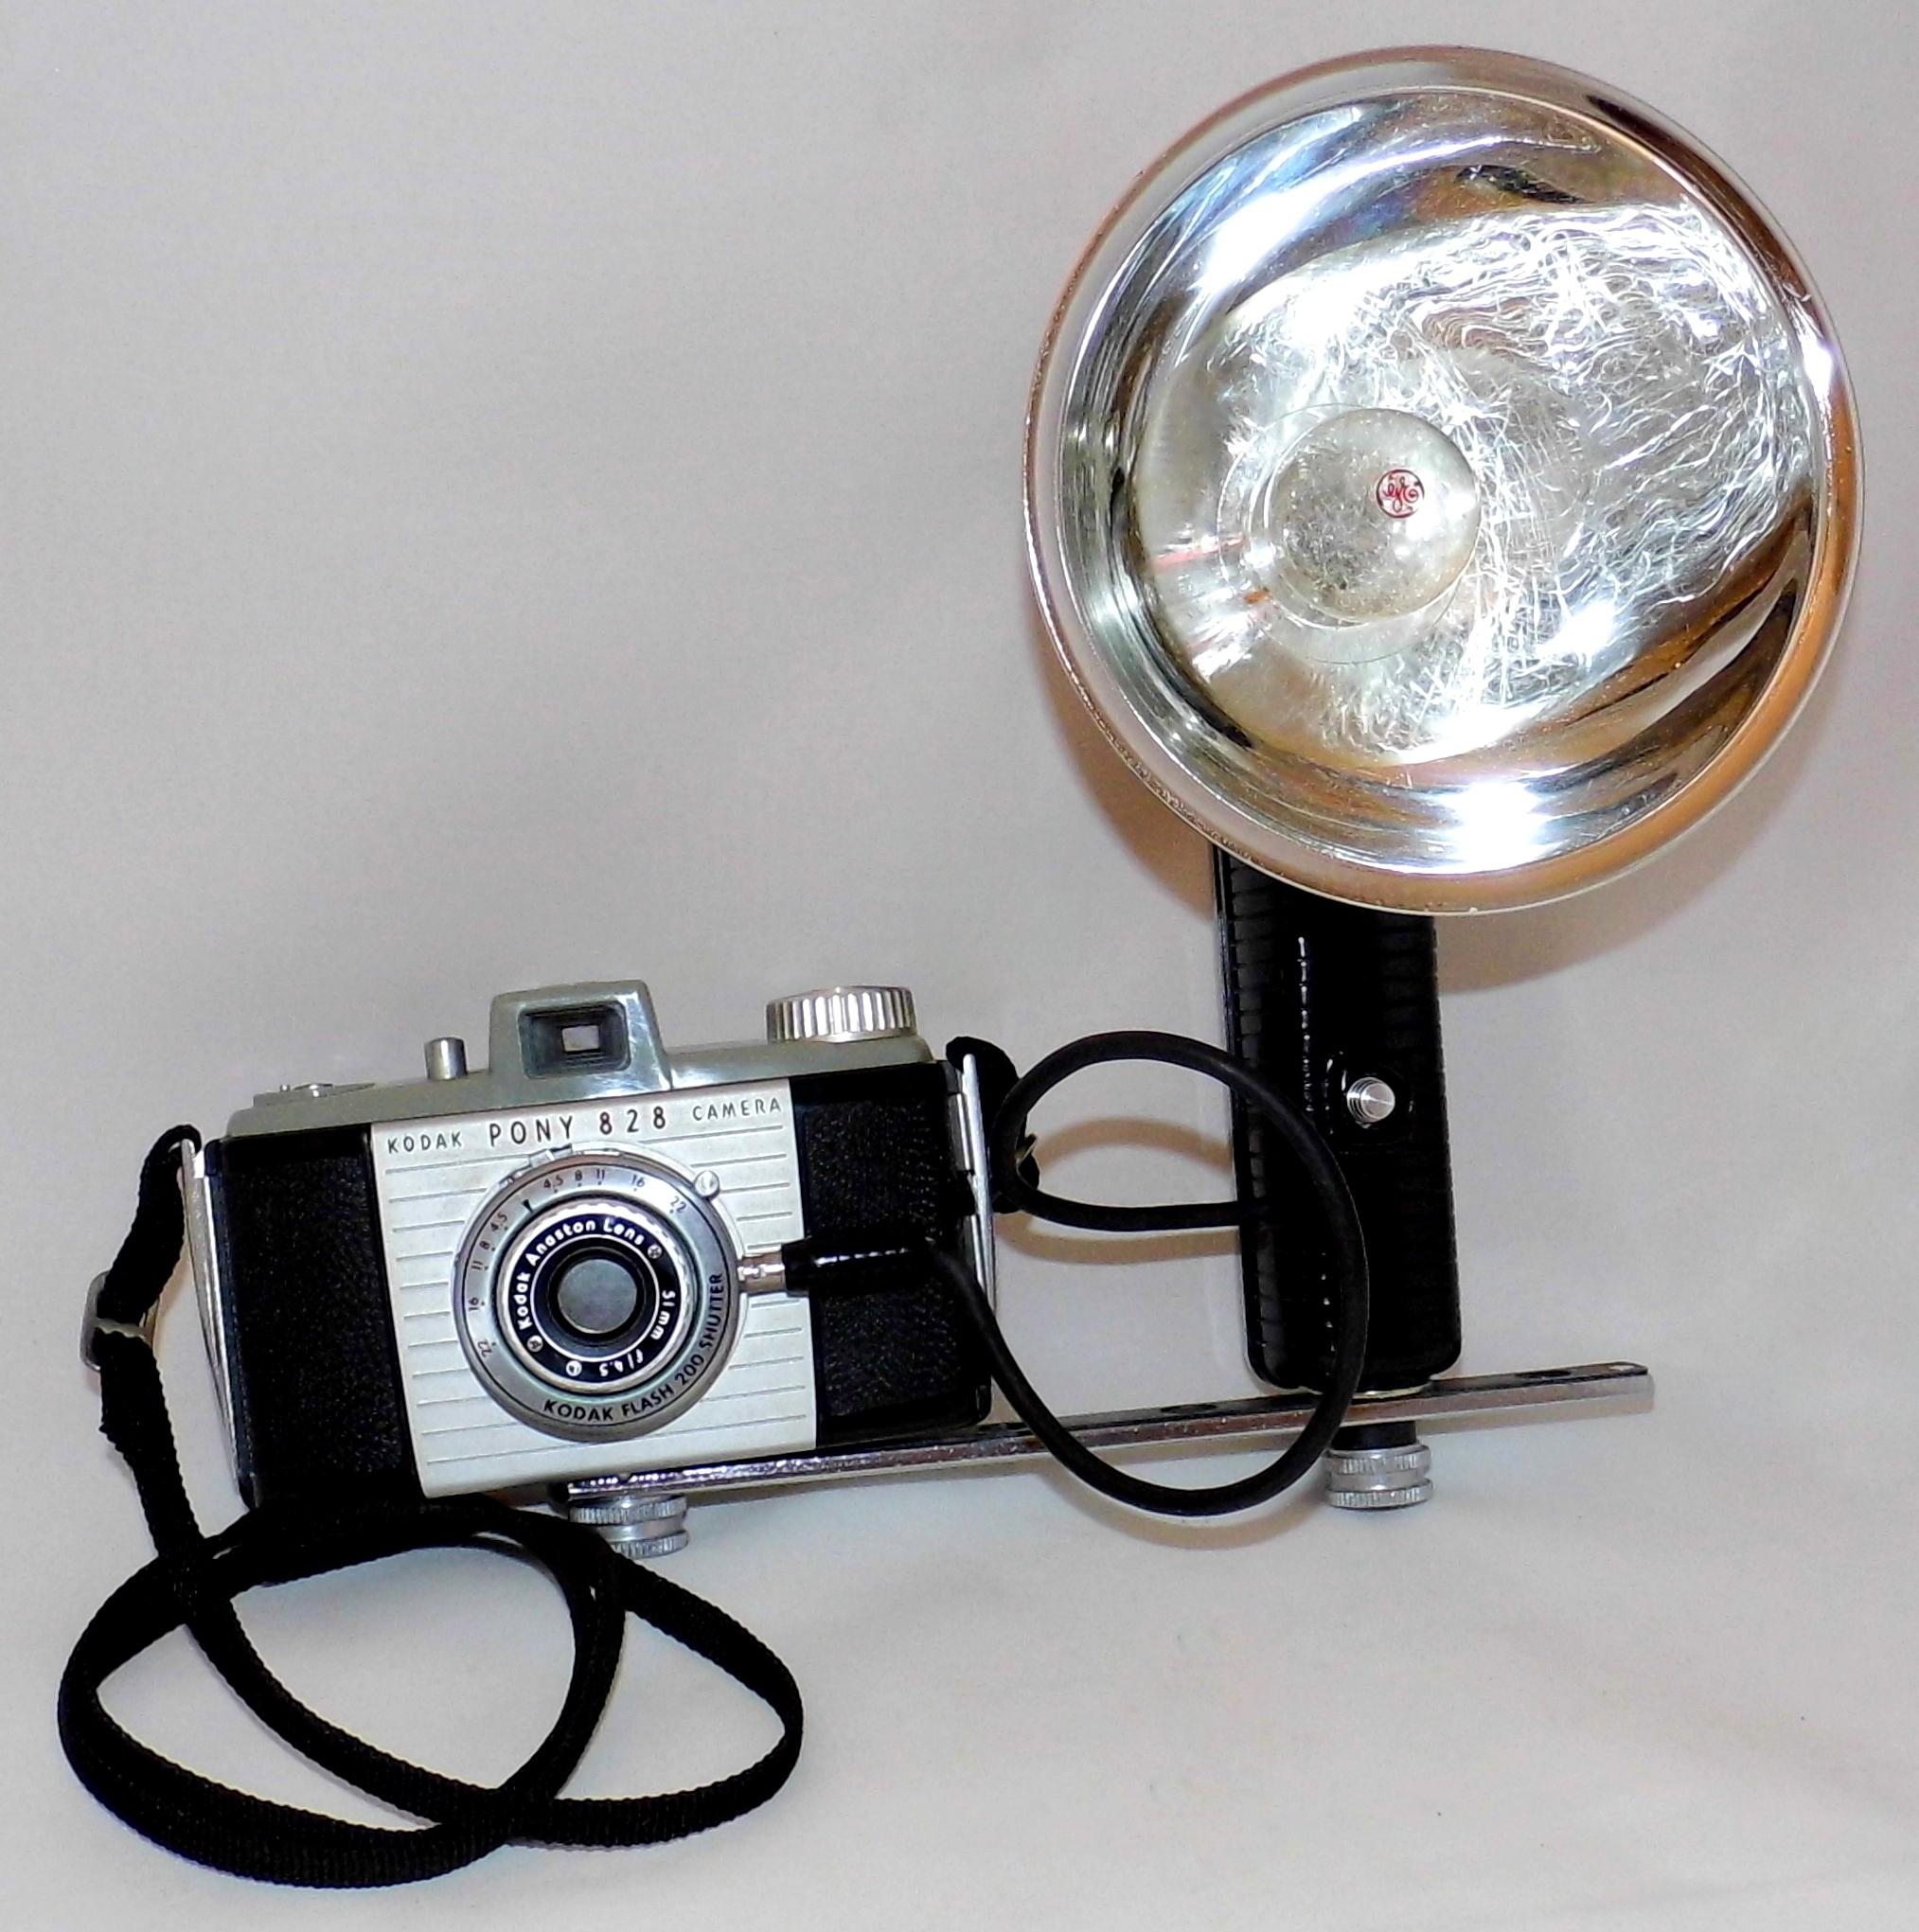 Kodak Pony Flash camera